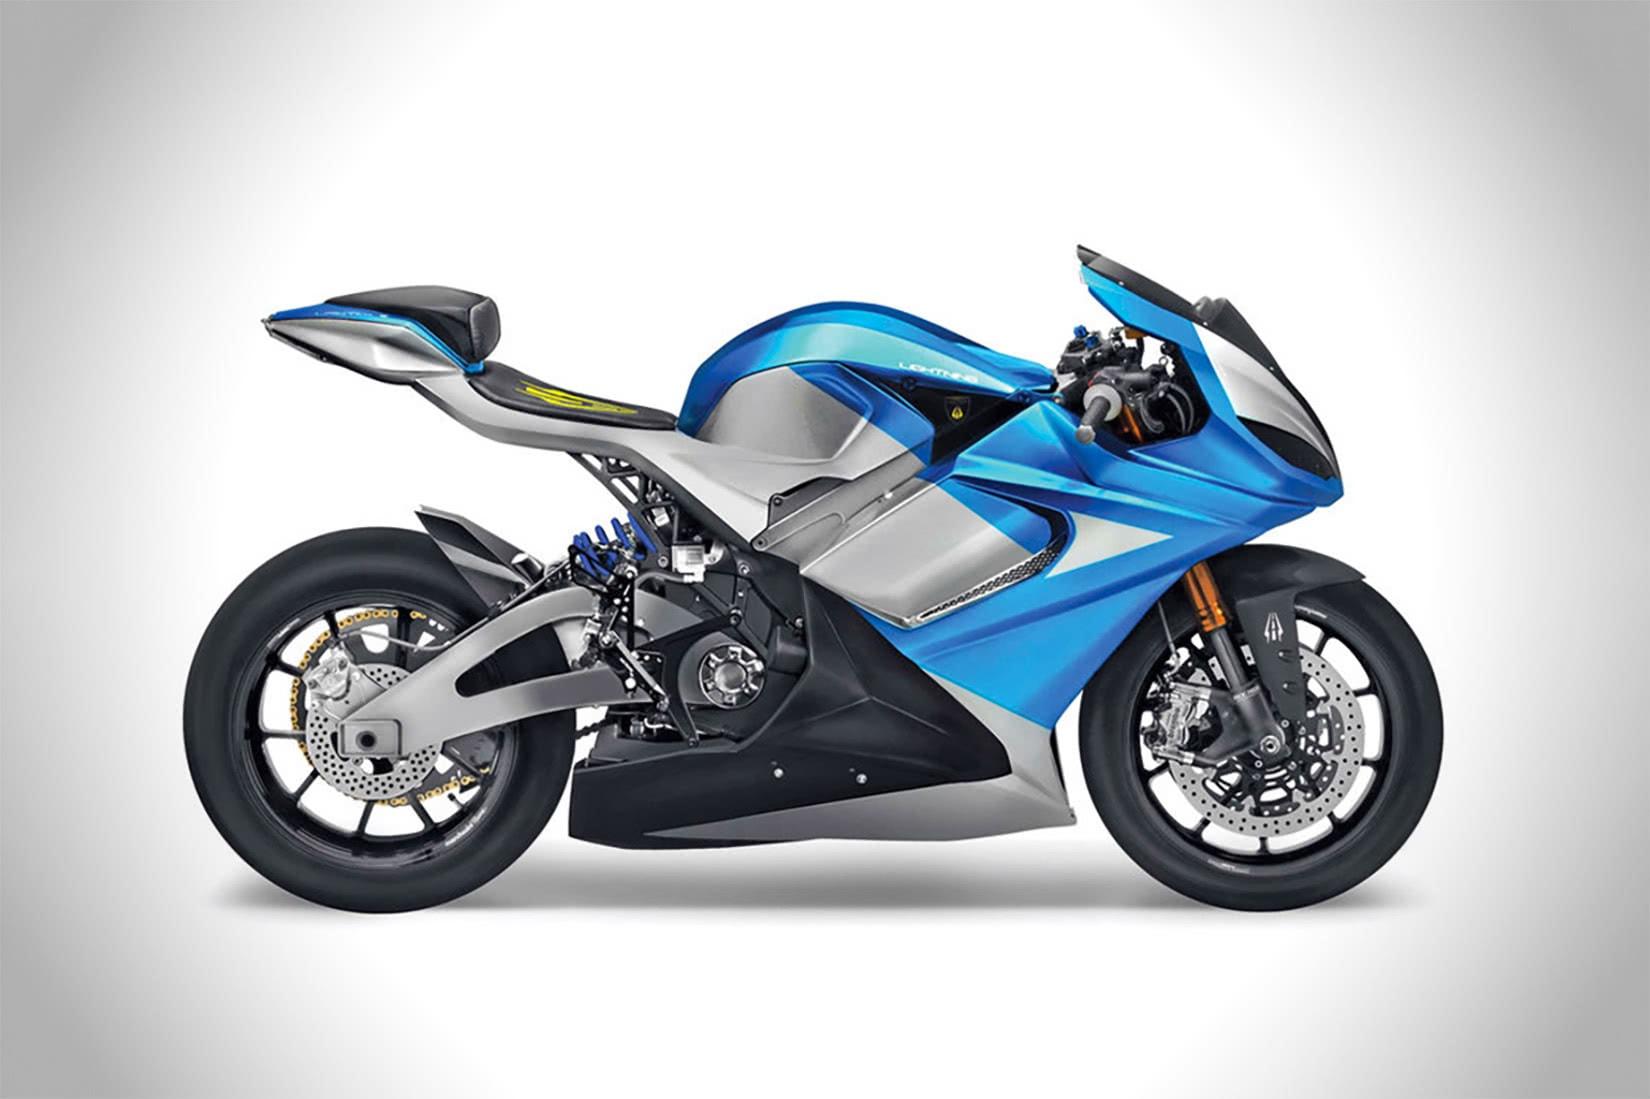 best electric motorcycles 2021 luxury Lightning LS-218 - Luxe Digital